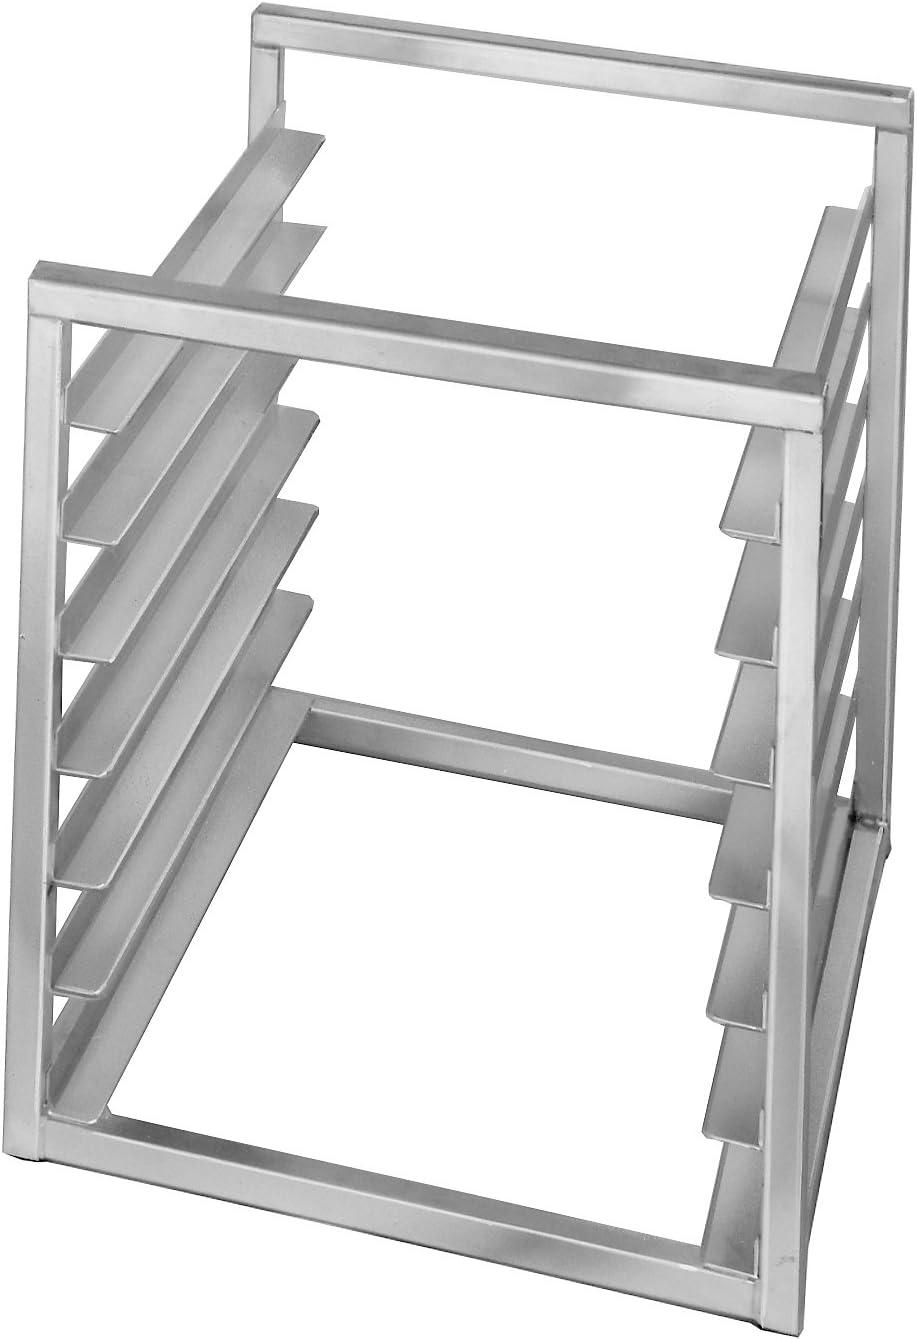 Channel Manufacturing RIR-7 7 Pan Aluminum End Load 20 1//2 x 23 x 23 Sheet Bun Pan Rack for Reach-Ins Assembled